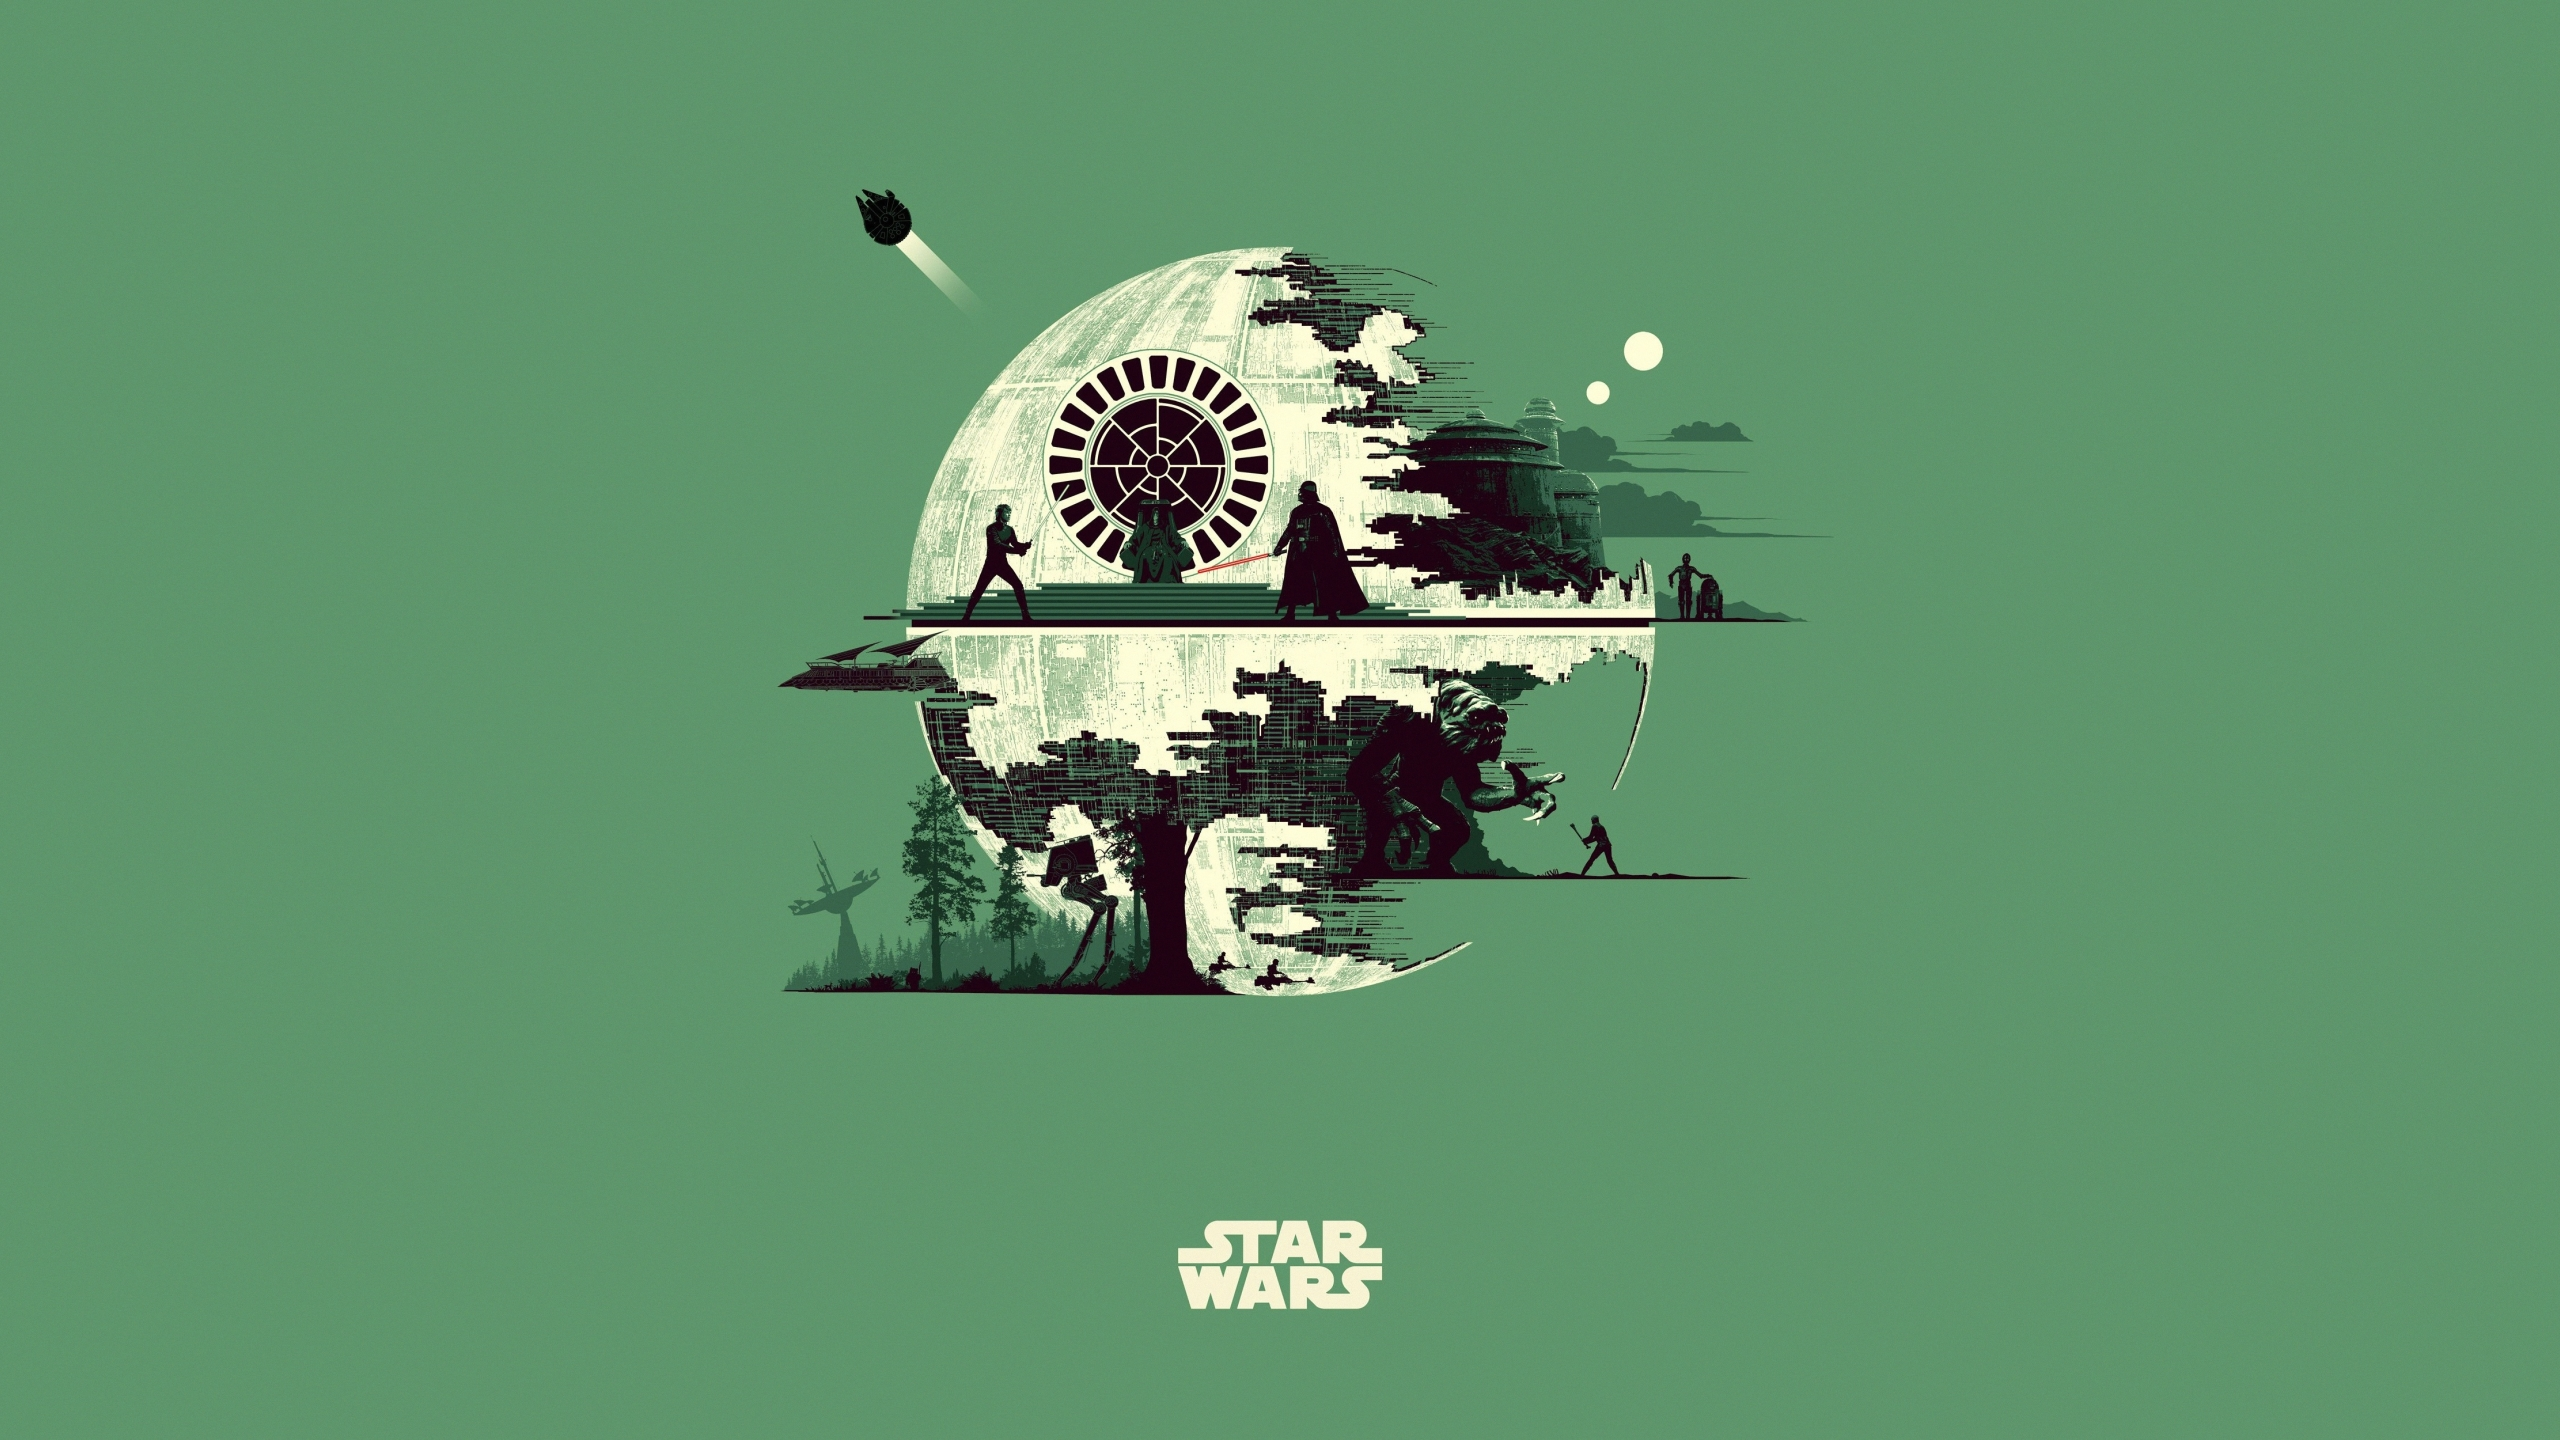 2560x1440 Star Wars Skywalker Saga Minimal 1440P ...